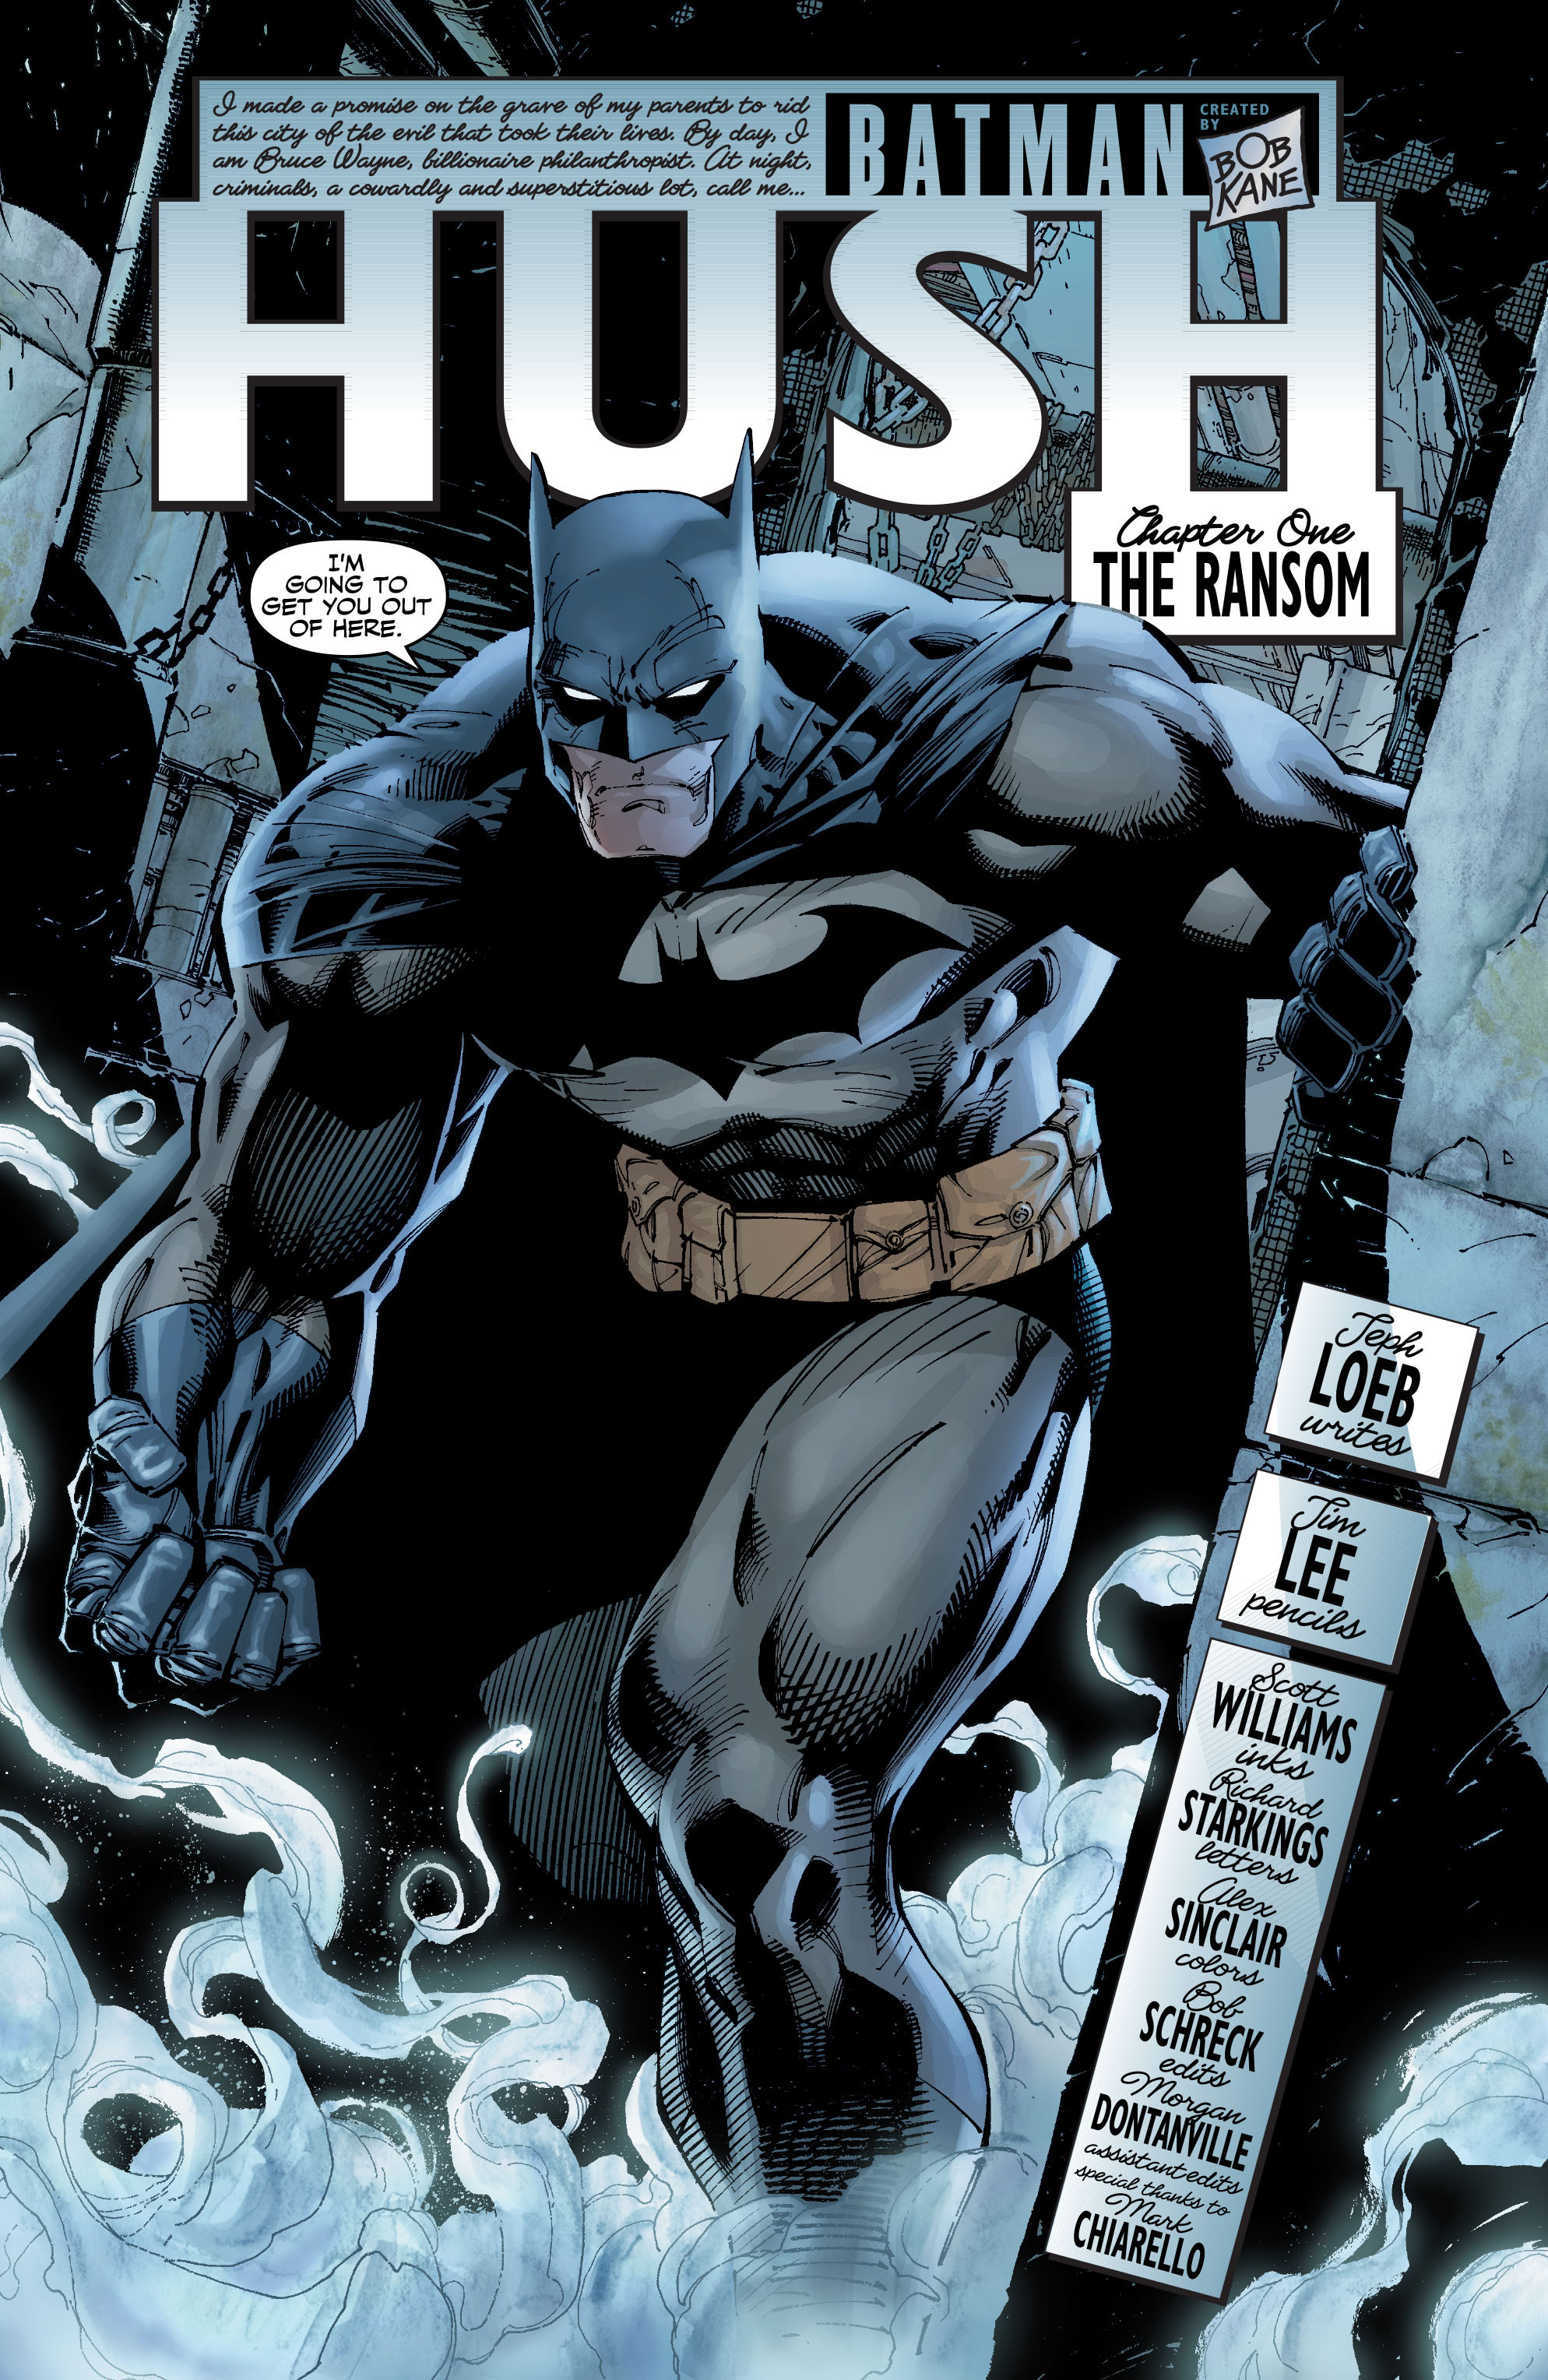 Psychology of Bruce Wayne ShhjR62Gp-d0TDo3zvQPIhrOQjAqFJq85PxNzo85CRo3p27OPtn0y309xhkfqU30ZW0zv9E2DV9f=s0